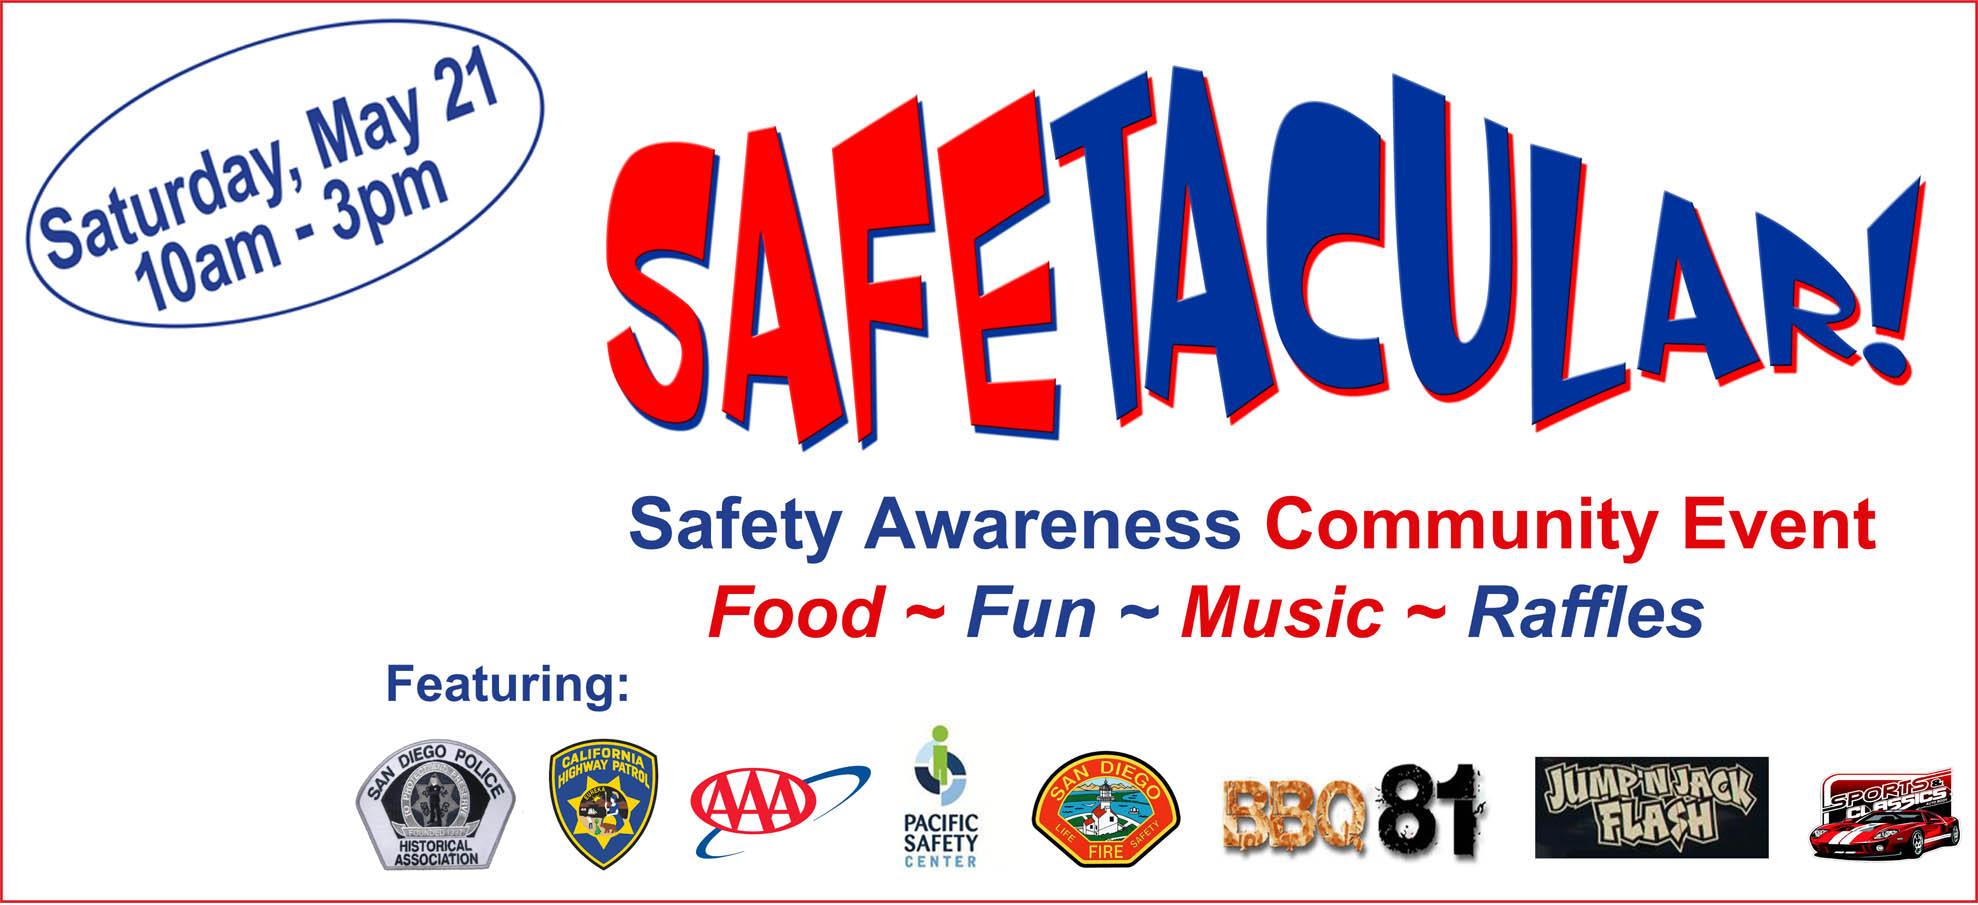 Safetacular Safety Awareness Community Event